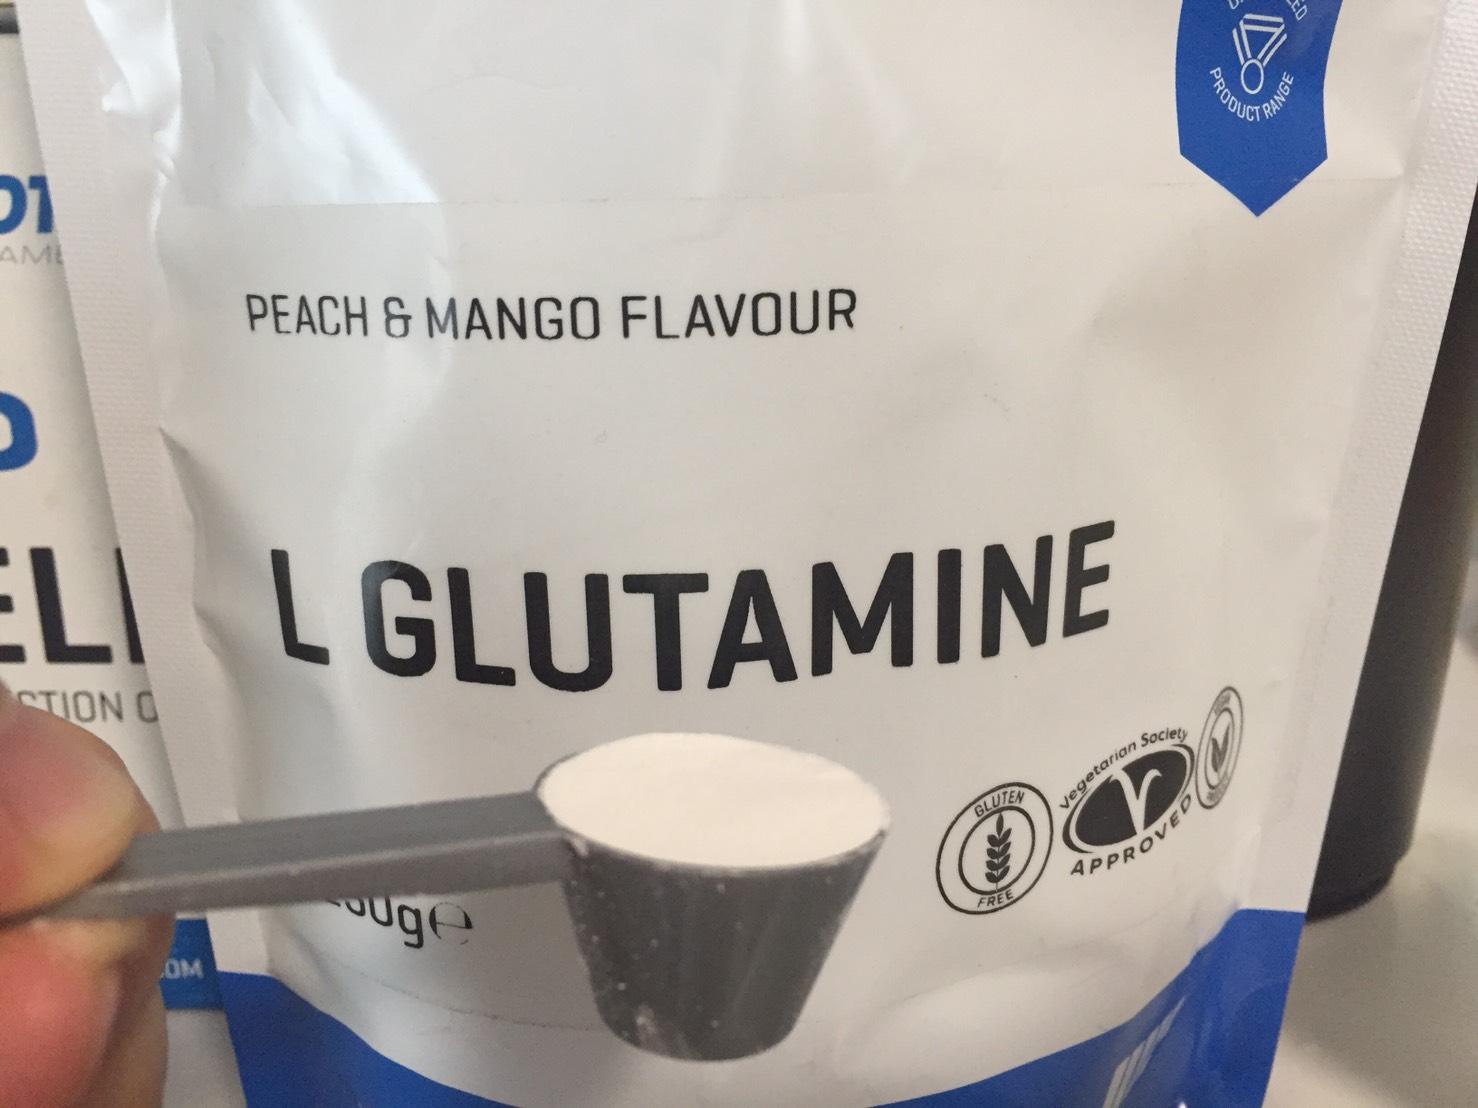 L-グルタミン「PEACH&MANGO FLAVOUR(ピーチ&マンゴー味)」の摺り切り一杯